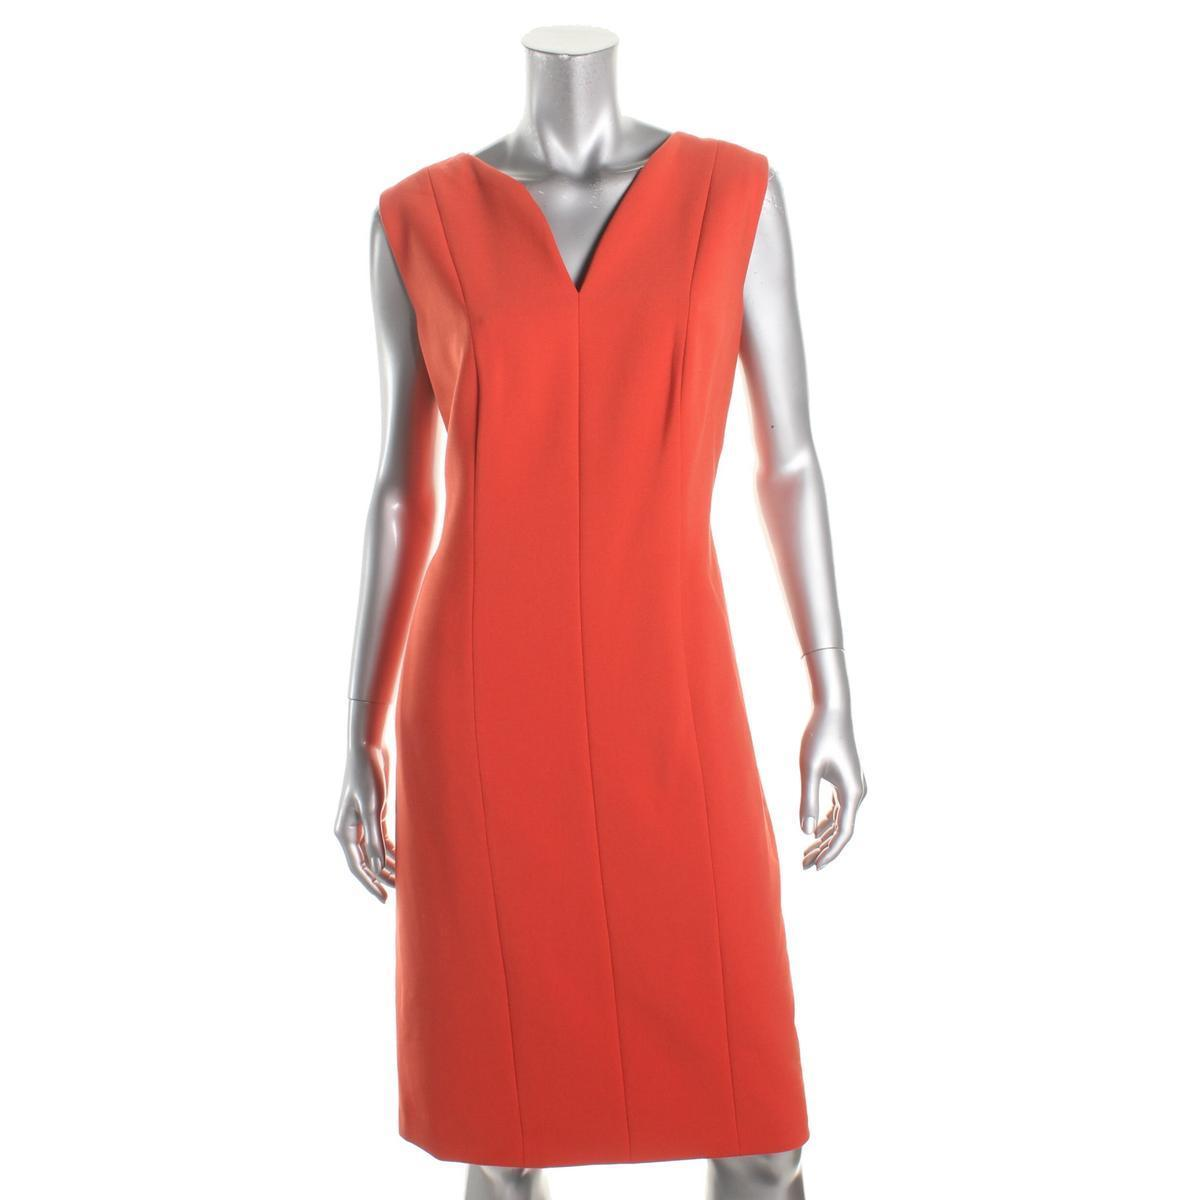 00a0eae108692 Hugo Boss świetna sukienka r.40/42 7516906148 - Allegro.pl